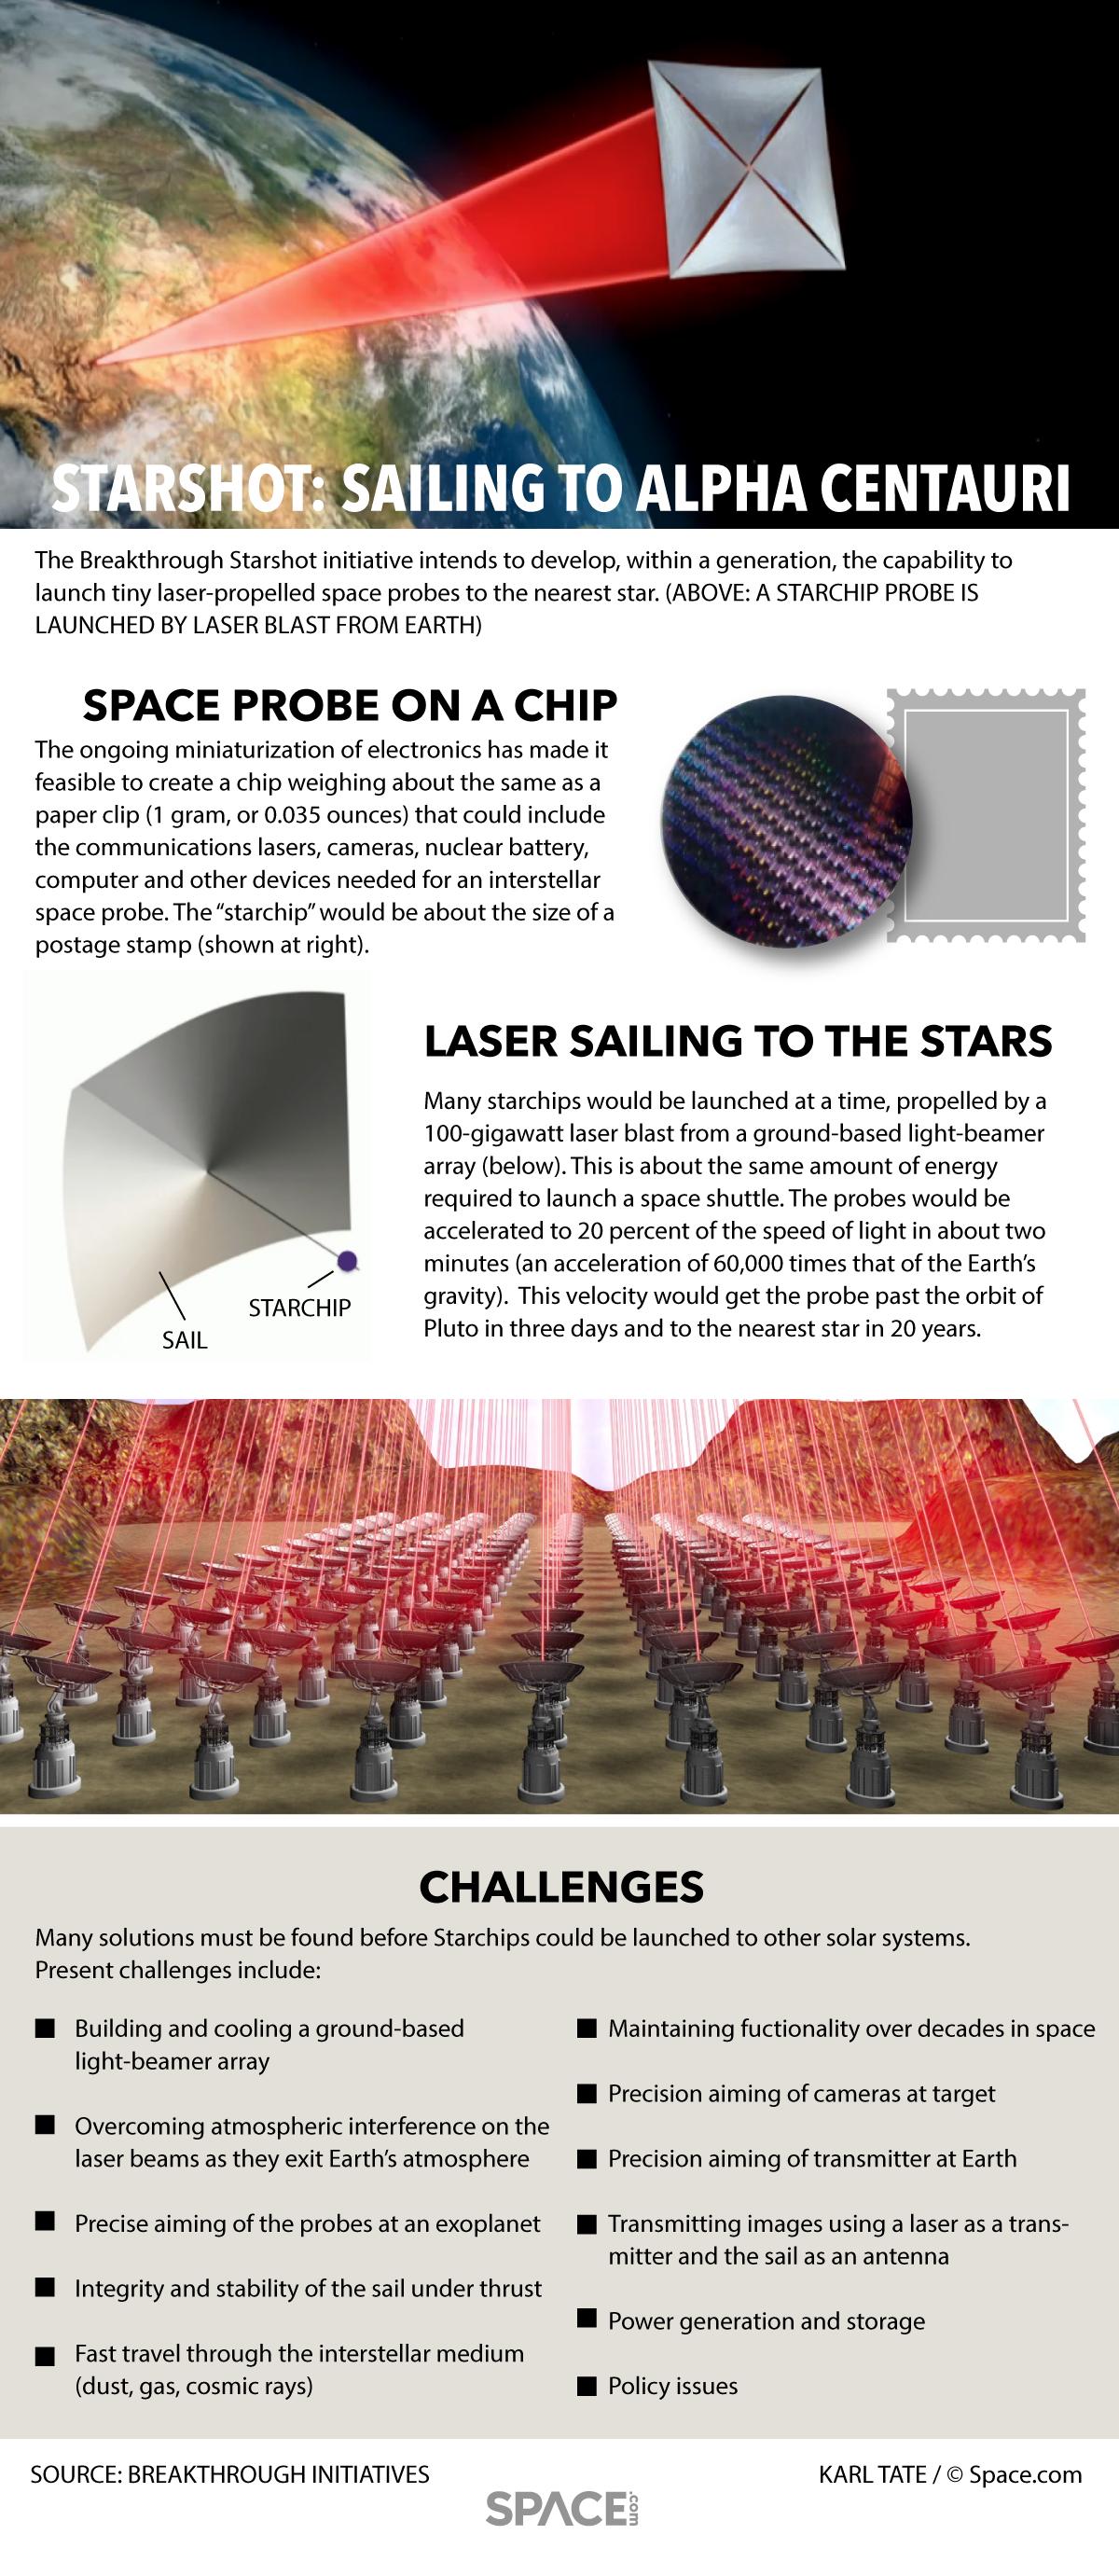 How Breakthrough Starshot's Interstellar Probes Would Work (Infographic)